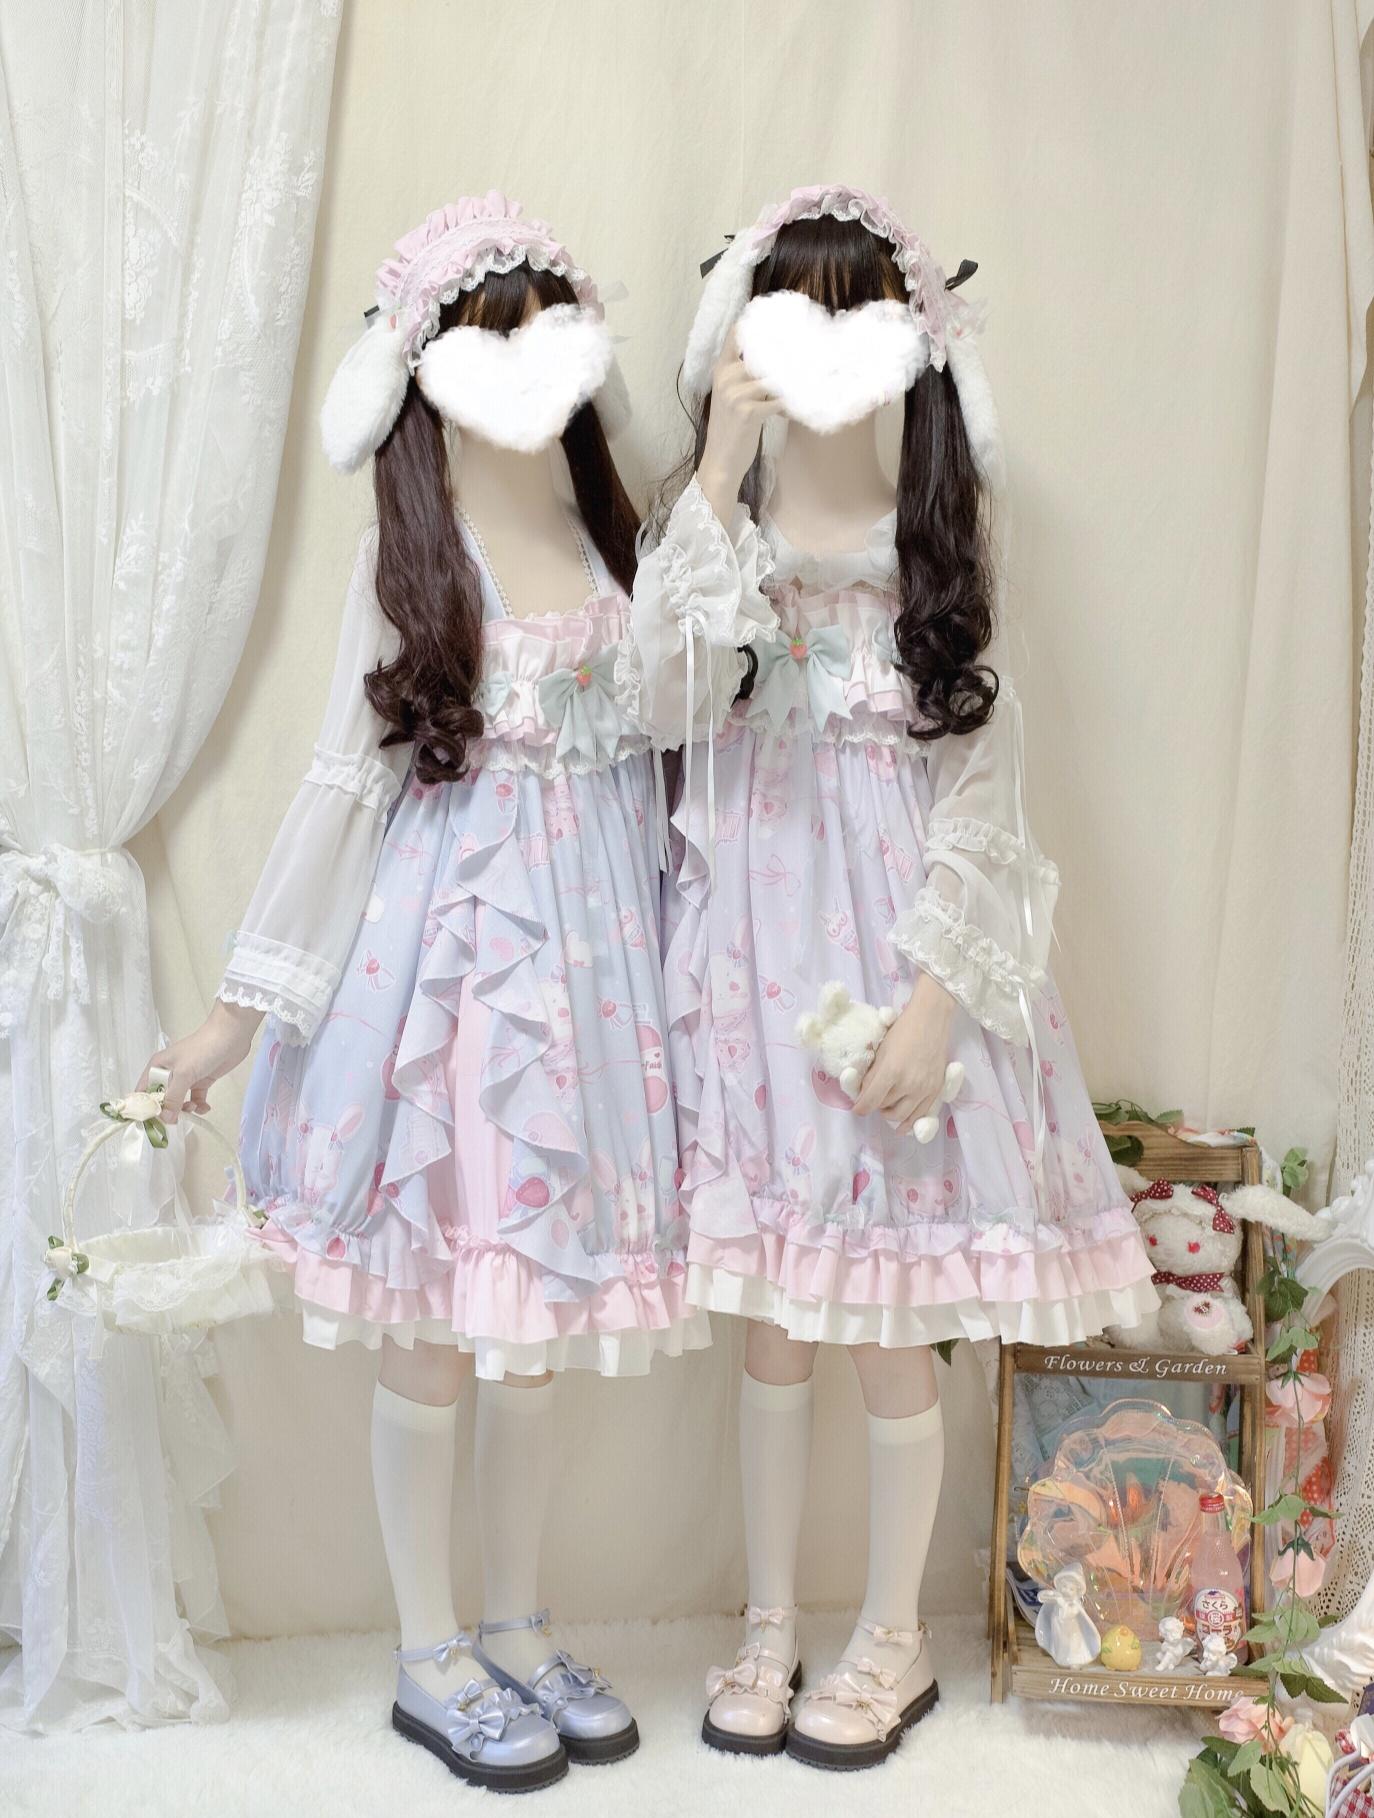 [spot] FFs strawberry original Lolita Dress dropped from stock